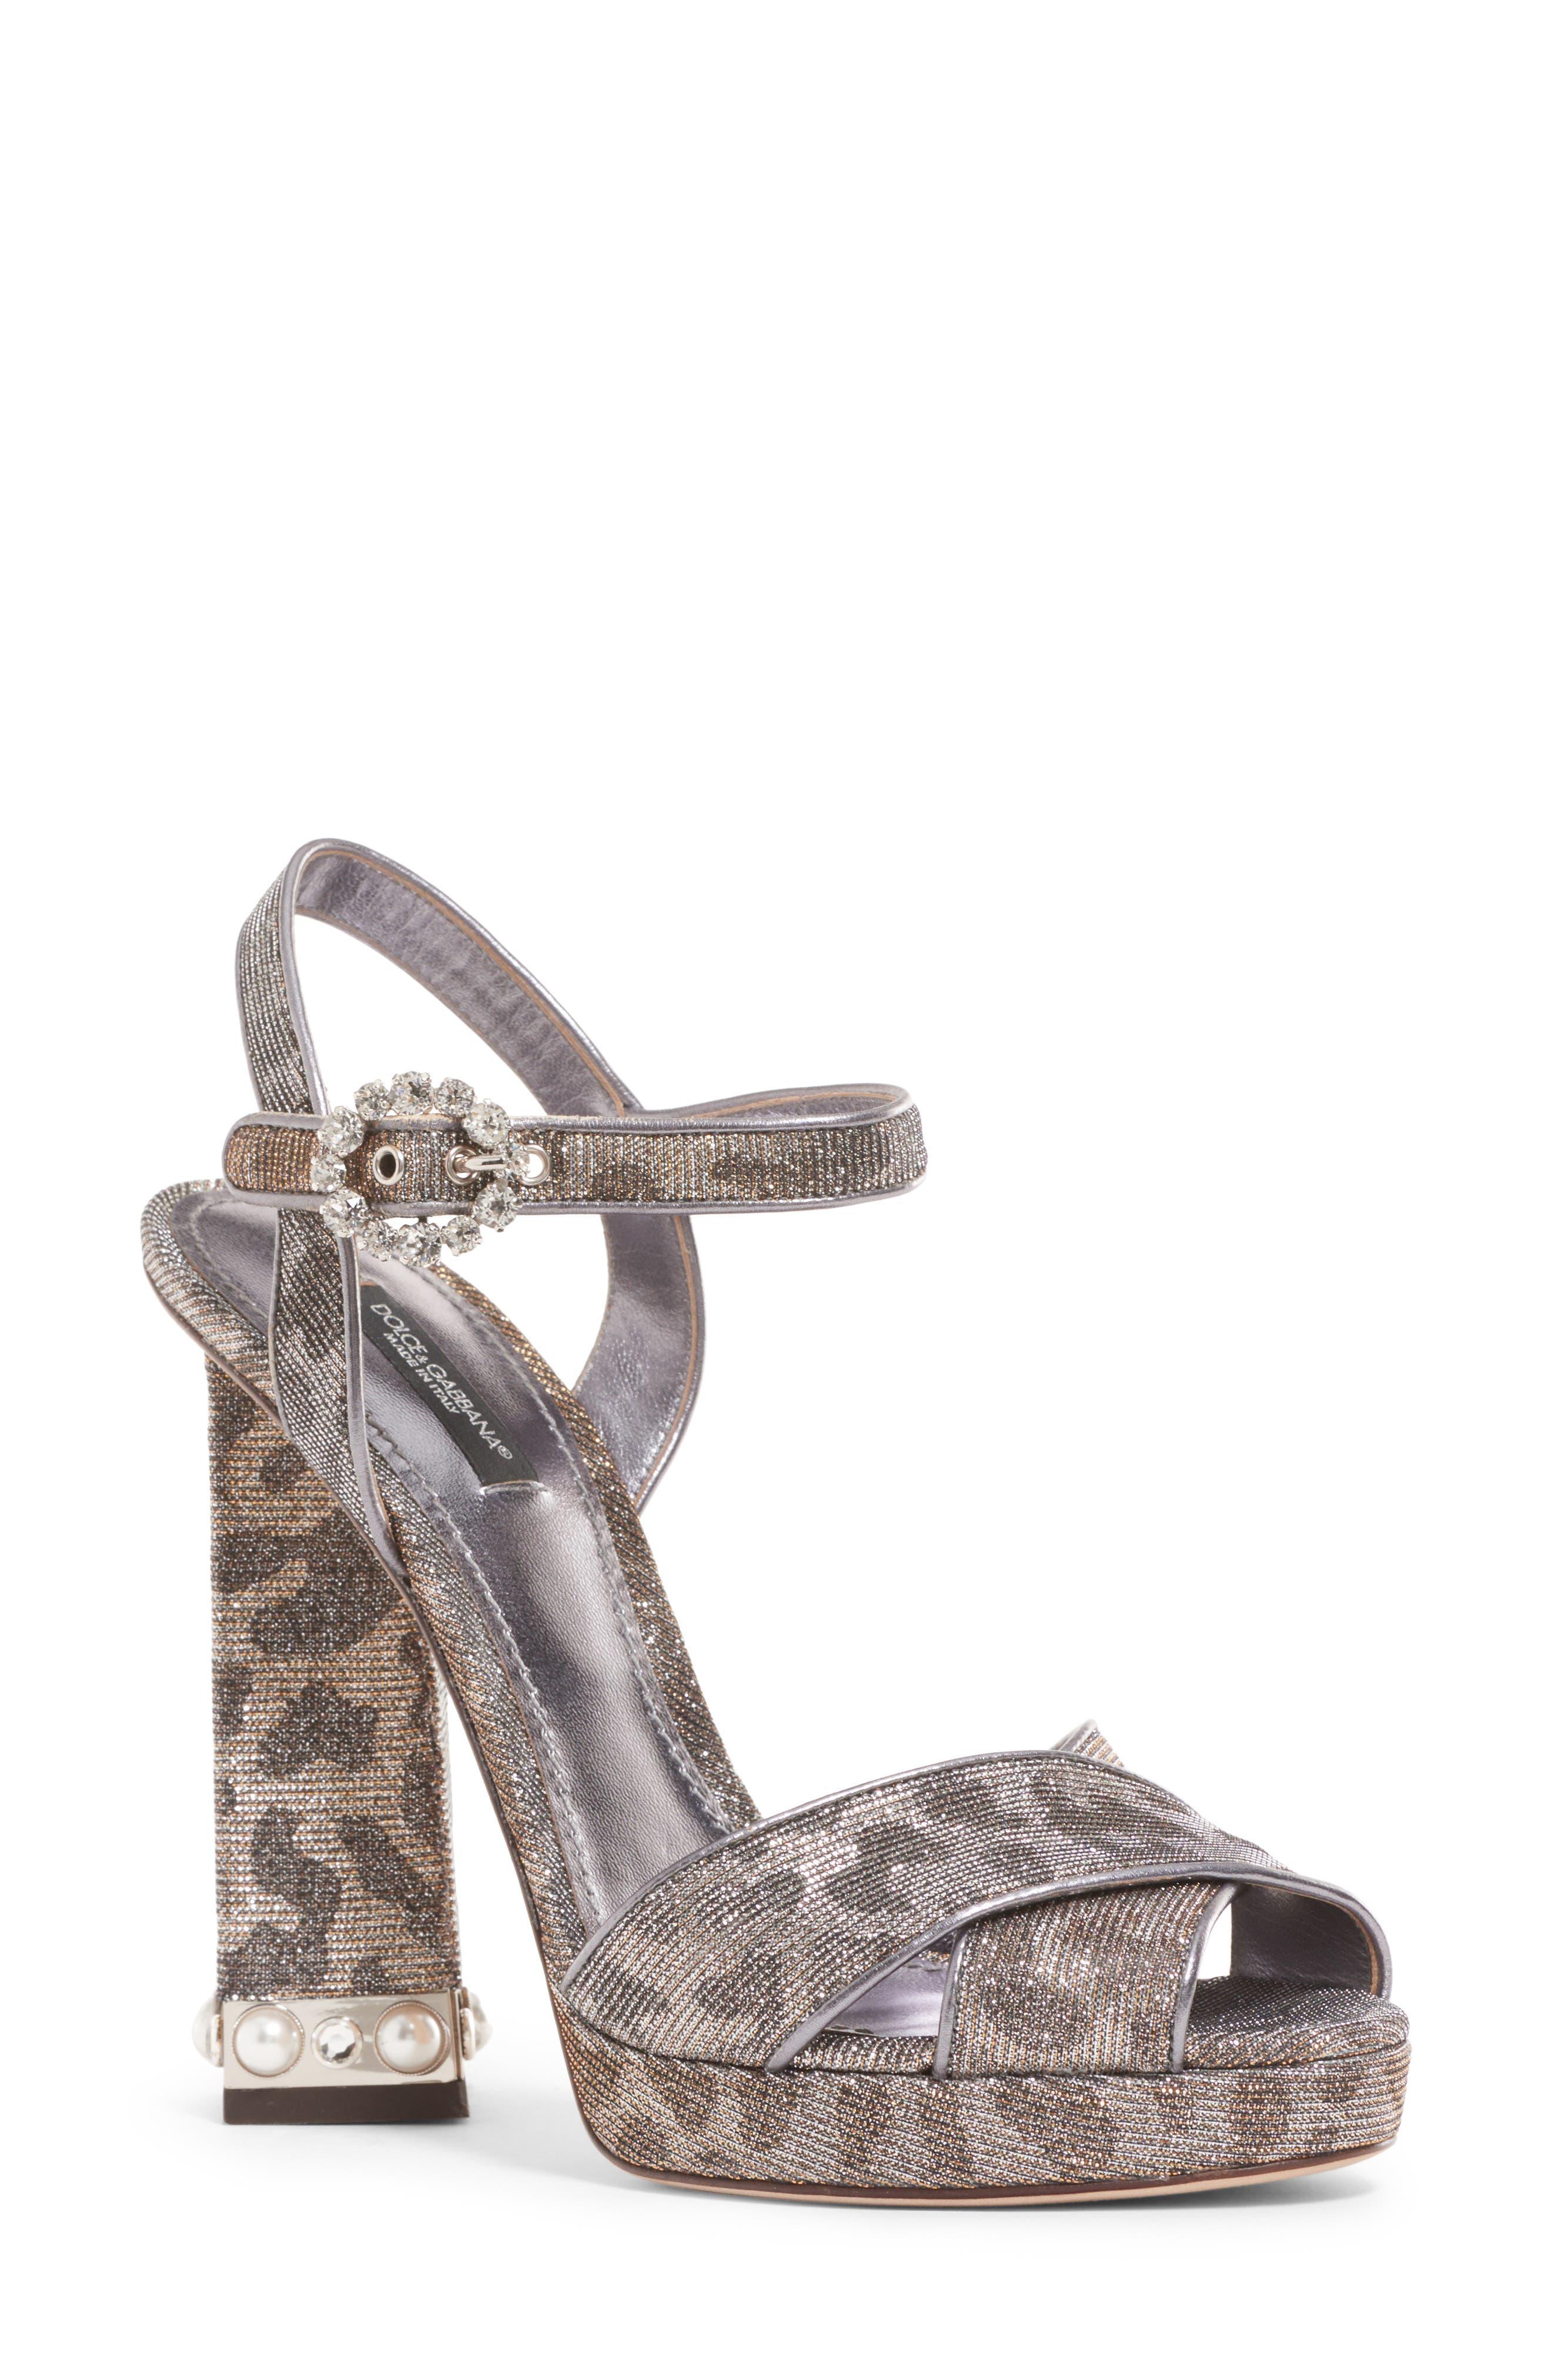 Alternate Image 1 Selected - Dolce&Gabbana Metallic Leopard Print Sandal (Women)